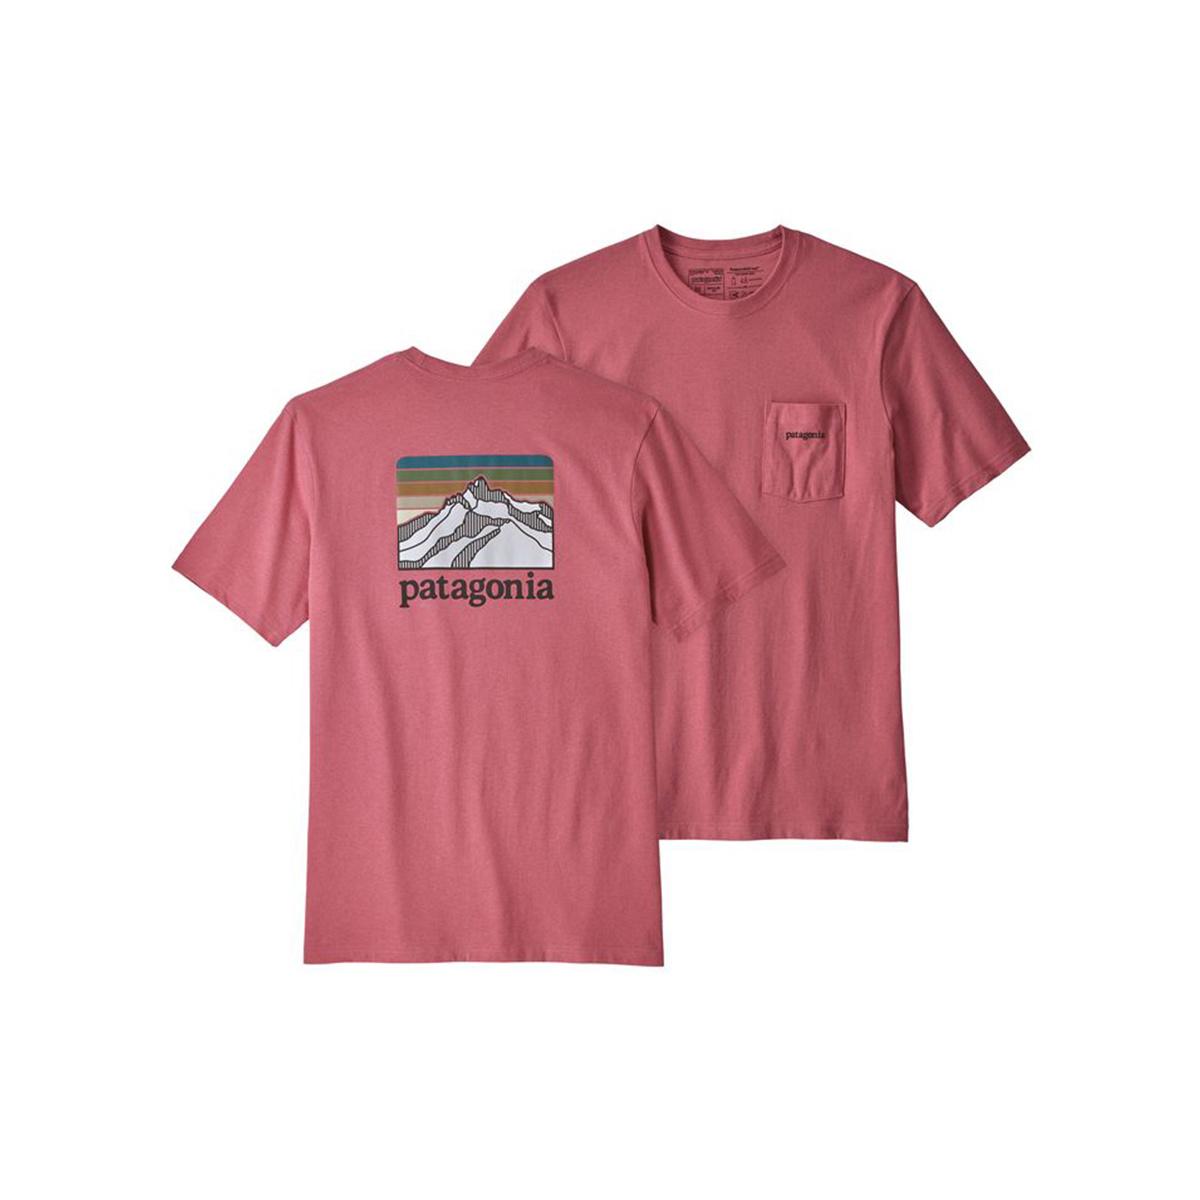 Patagonia Men's Line Logo Ridge Pocket Responsibli-Tee